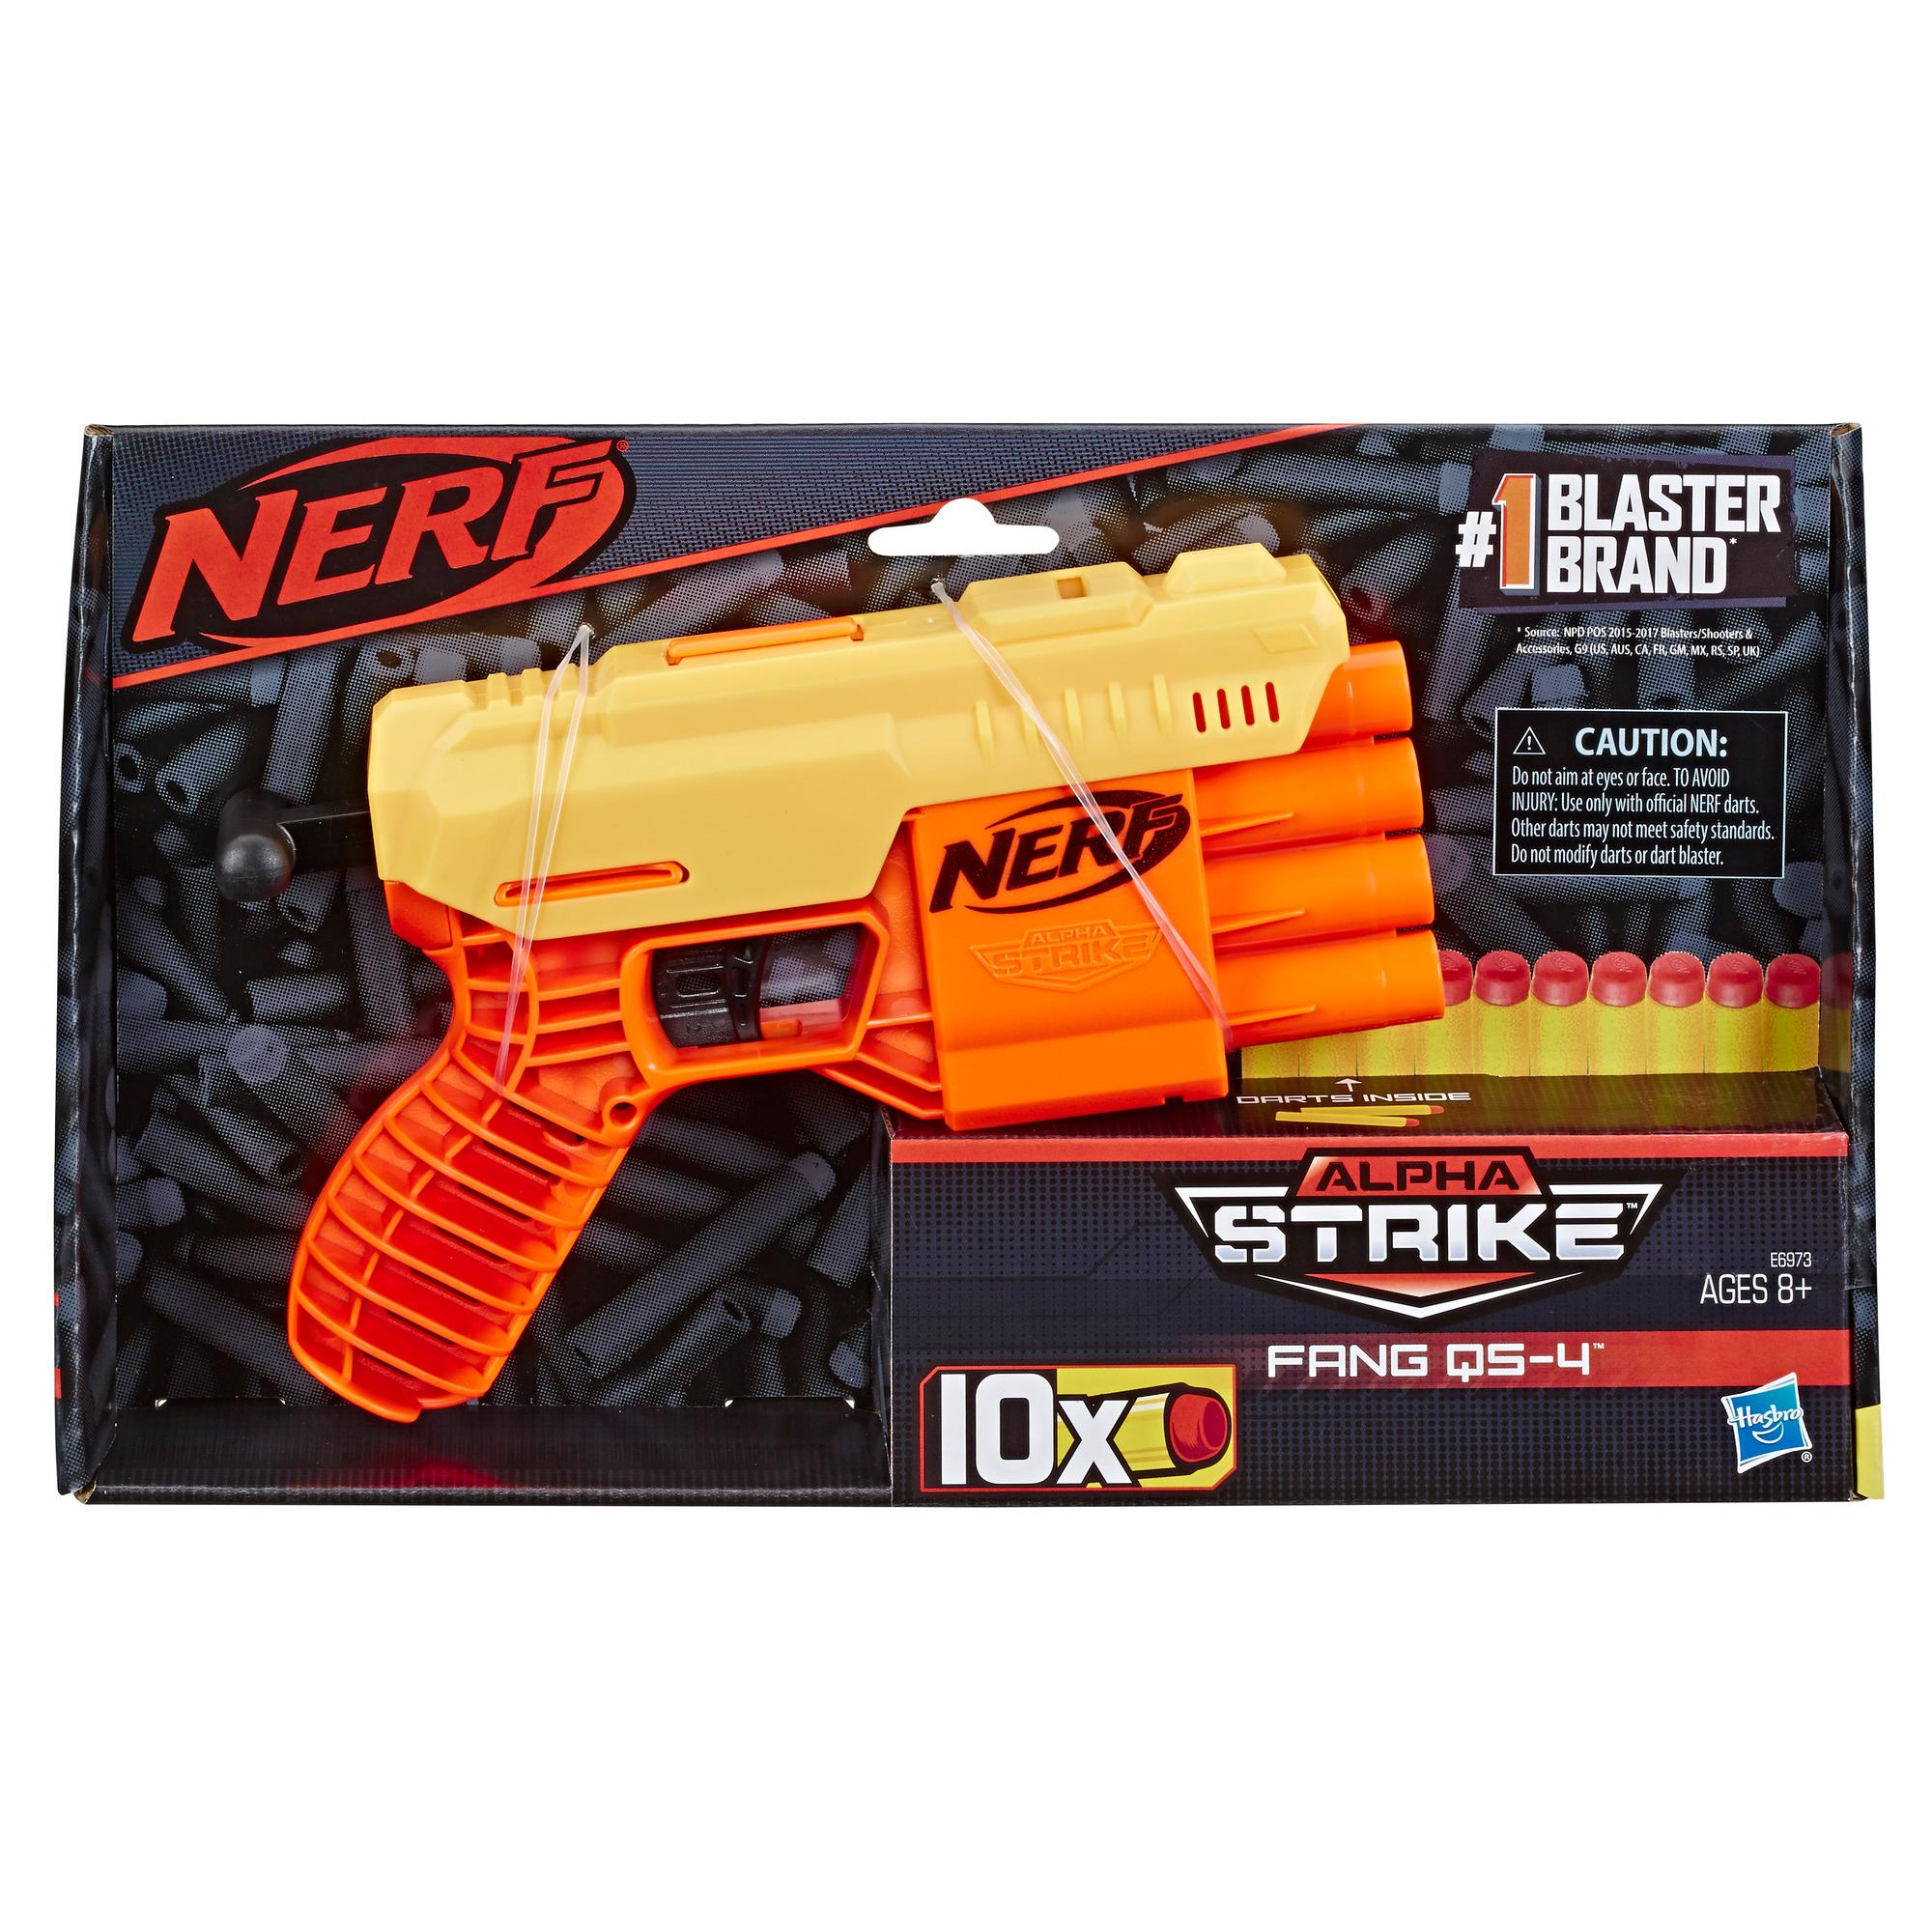 Fang QS-4 Nerf Alpha Strike Blaster